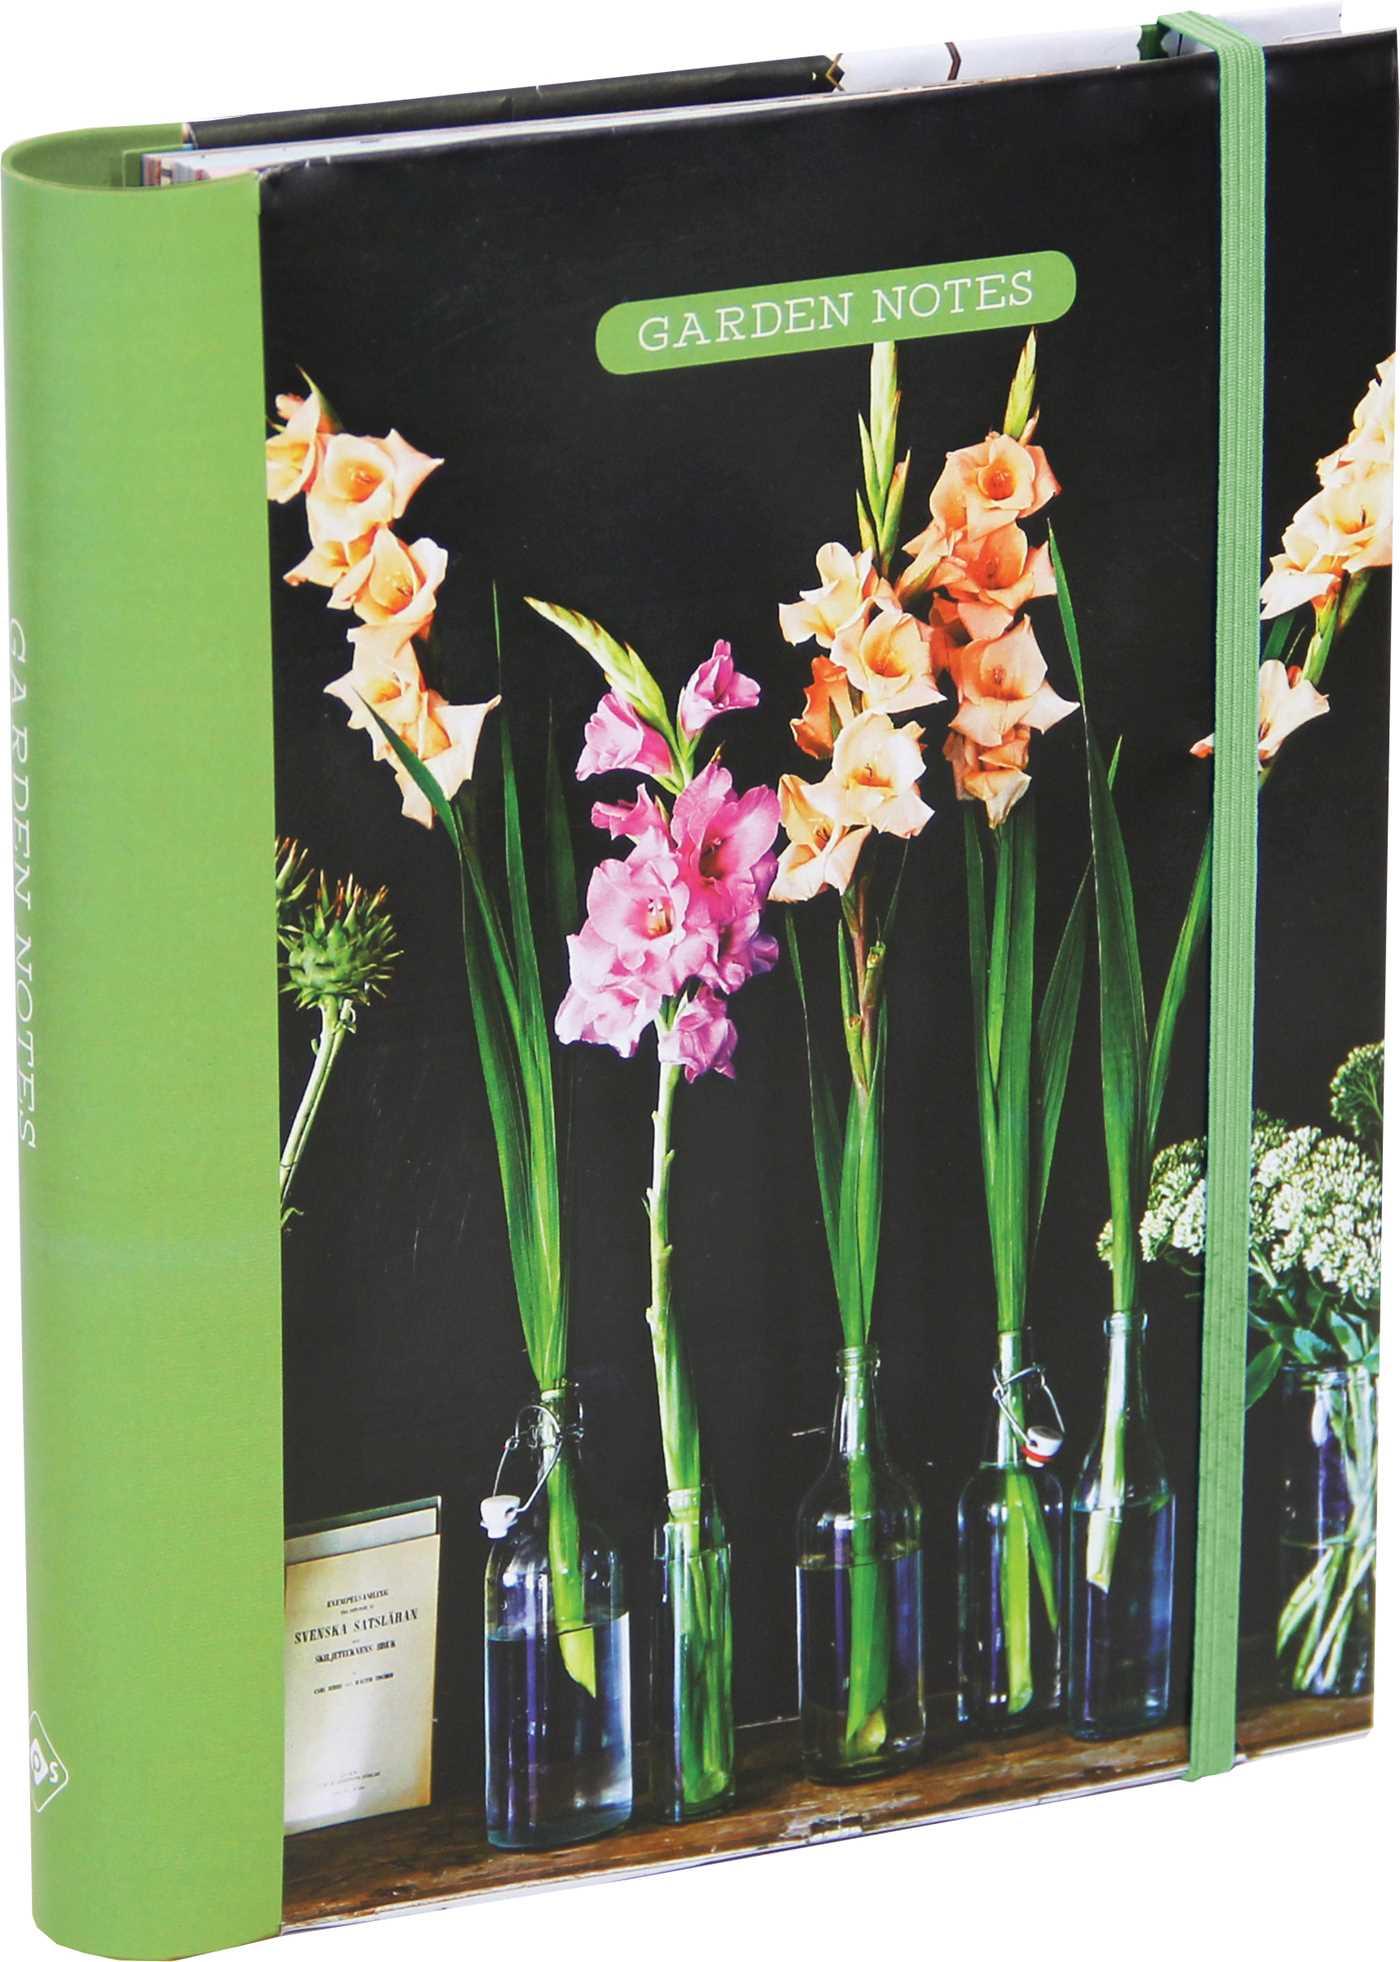 Botanical style garden notes 9781849759472 hr